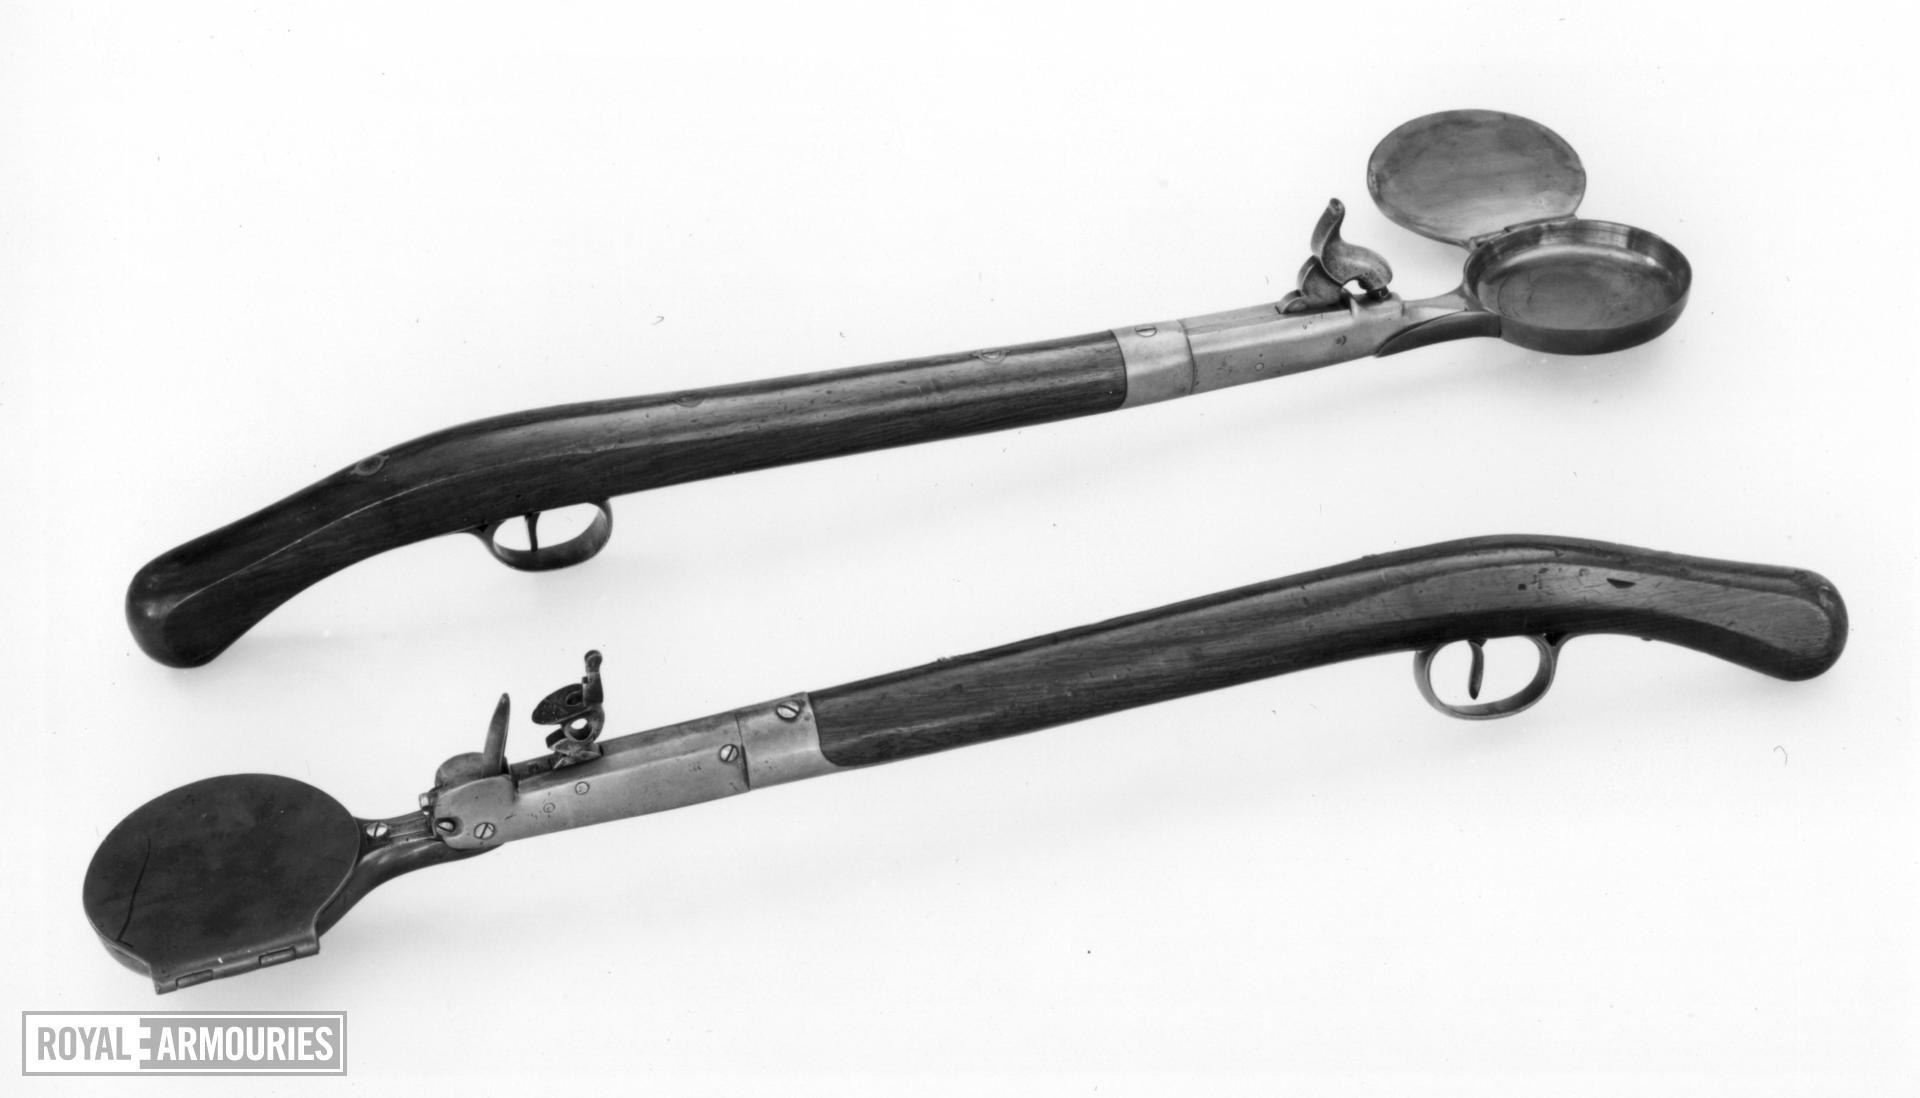 Flintlock signal pan